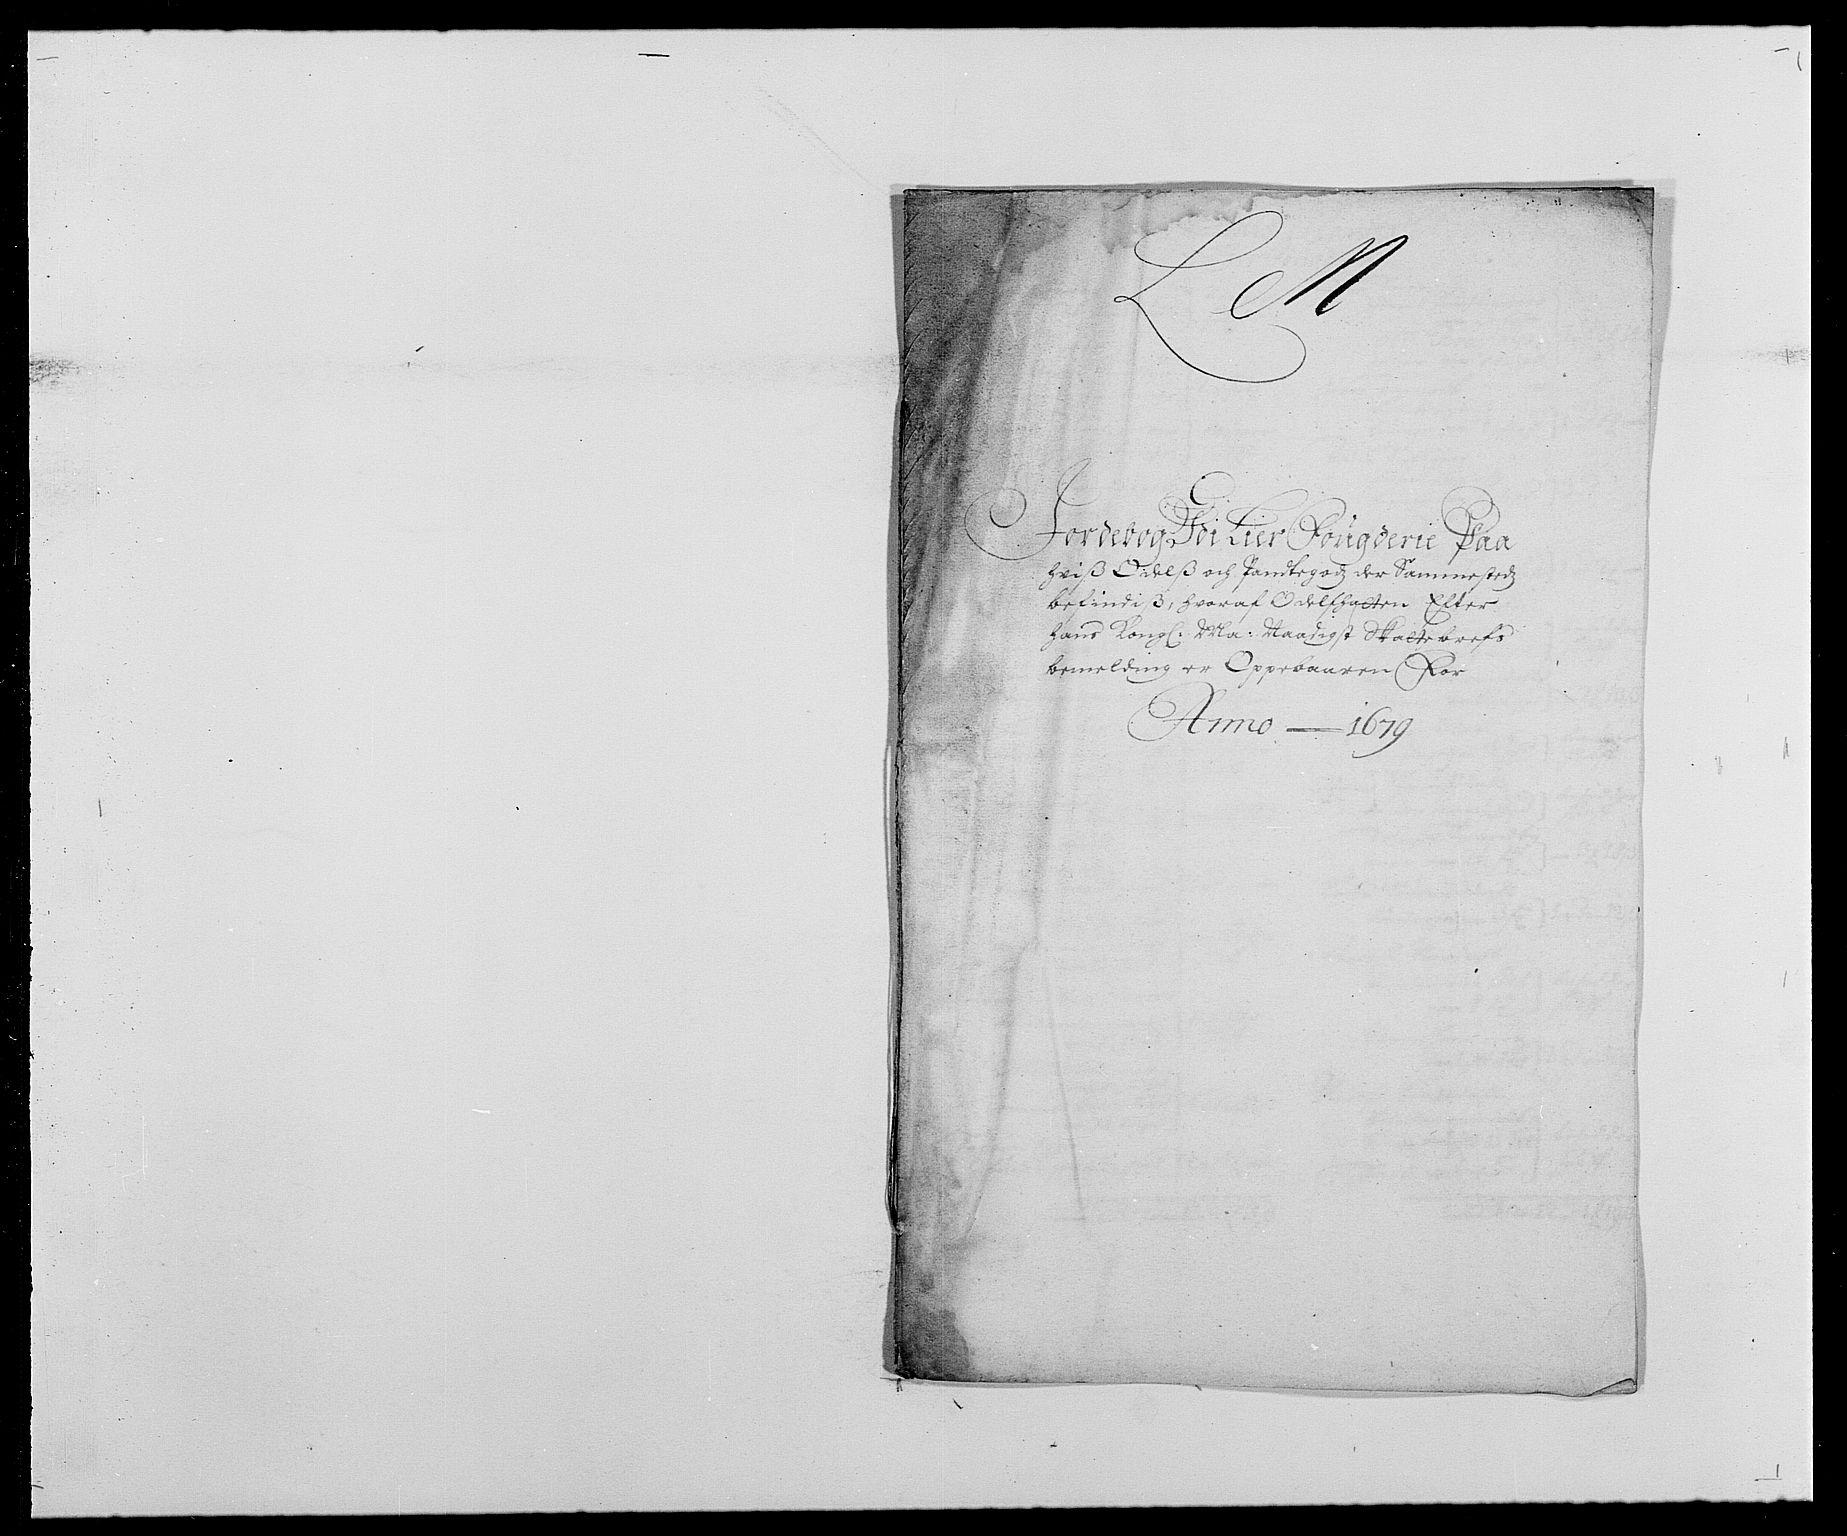 RA, Rentekammeret inntil 1814, Reviderte regnskaper, Fogderegnskap, R27/L1686: Fogderegnskap Lier, 1678-1686, s. 175